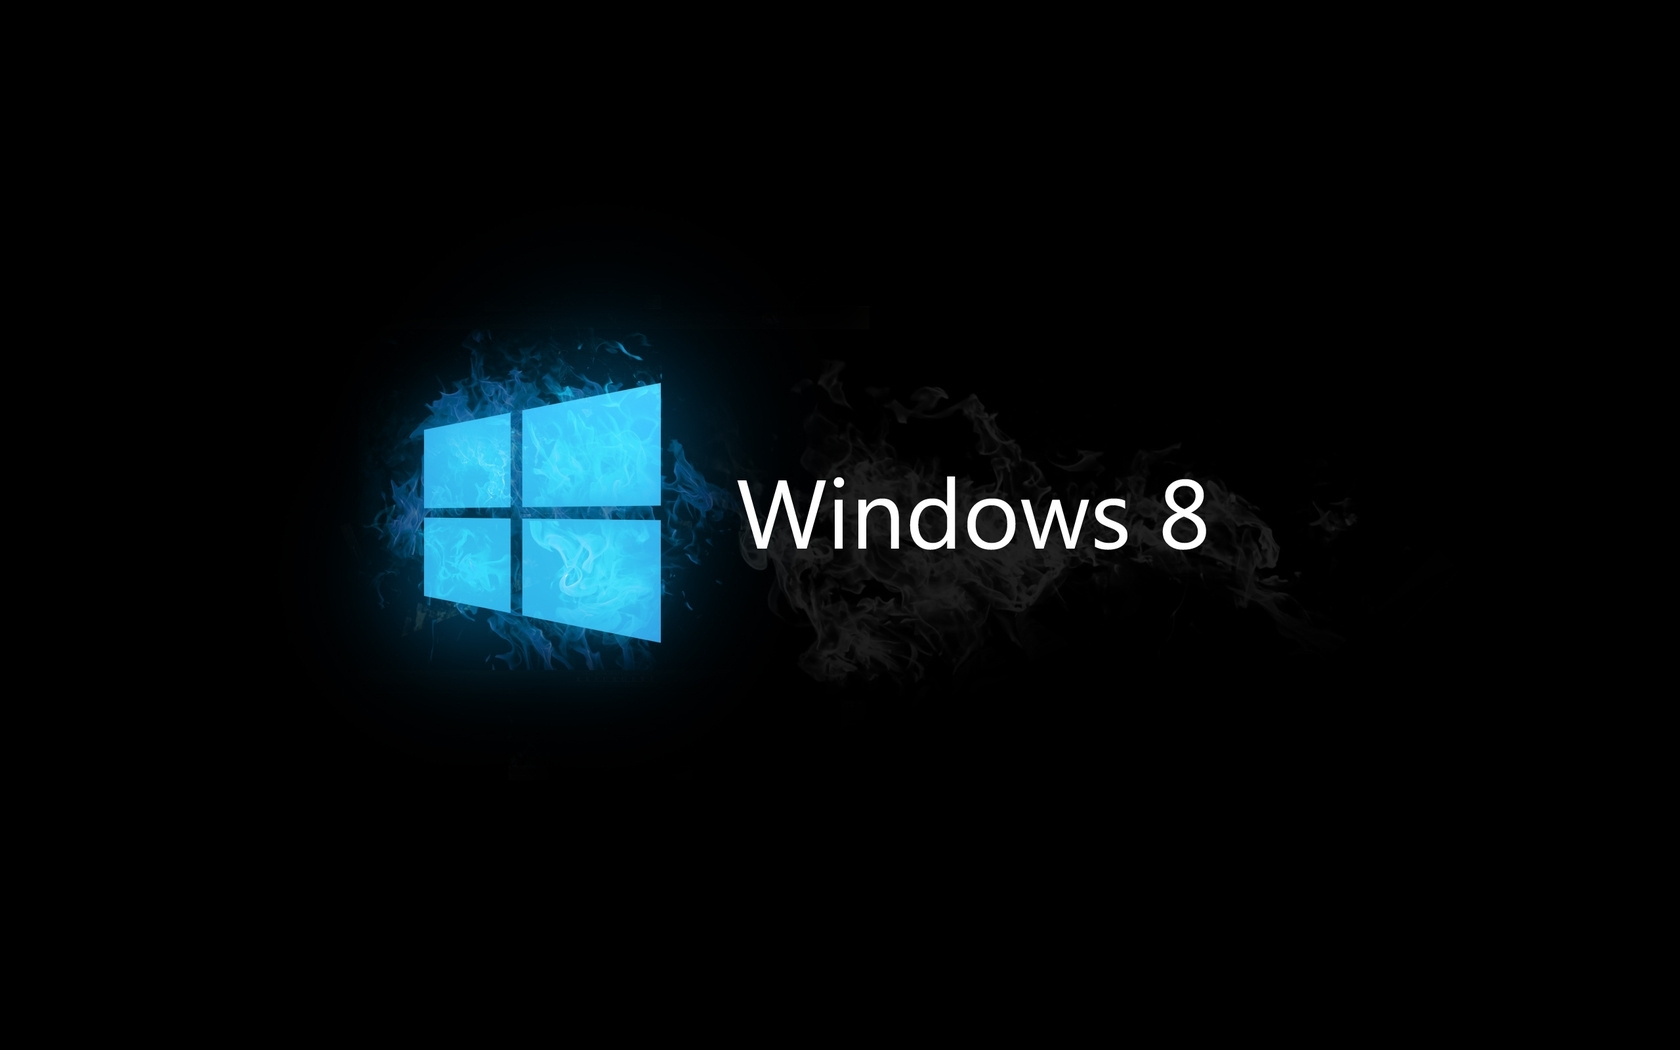 windows 8 fond d'écran and arrière-plan | 1680x1050 | id:368449